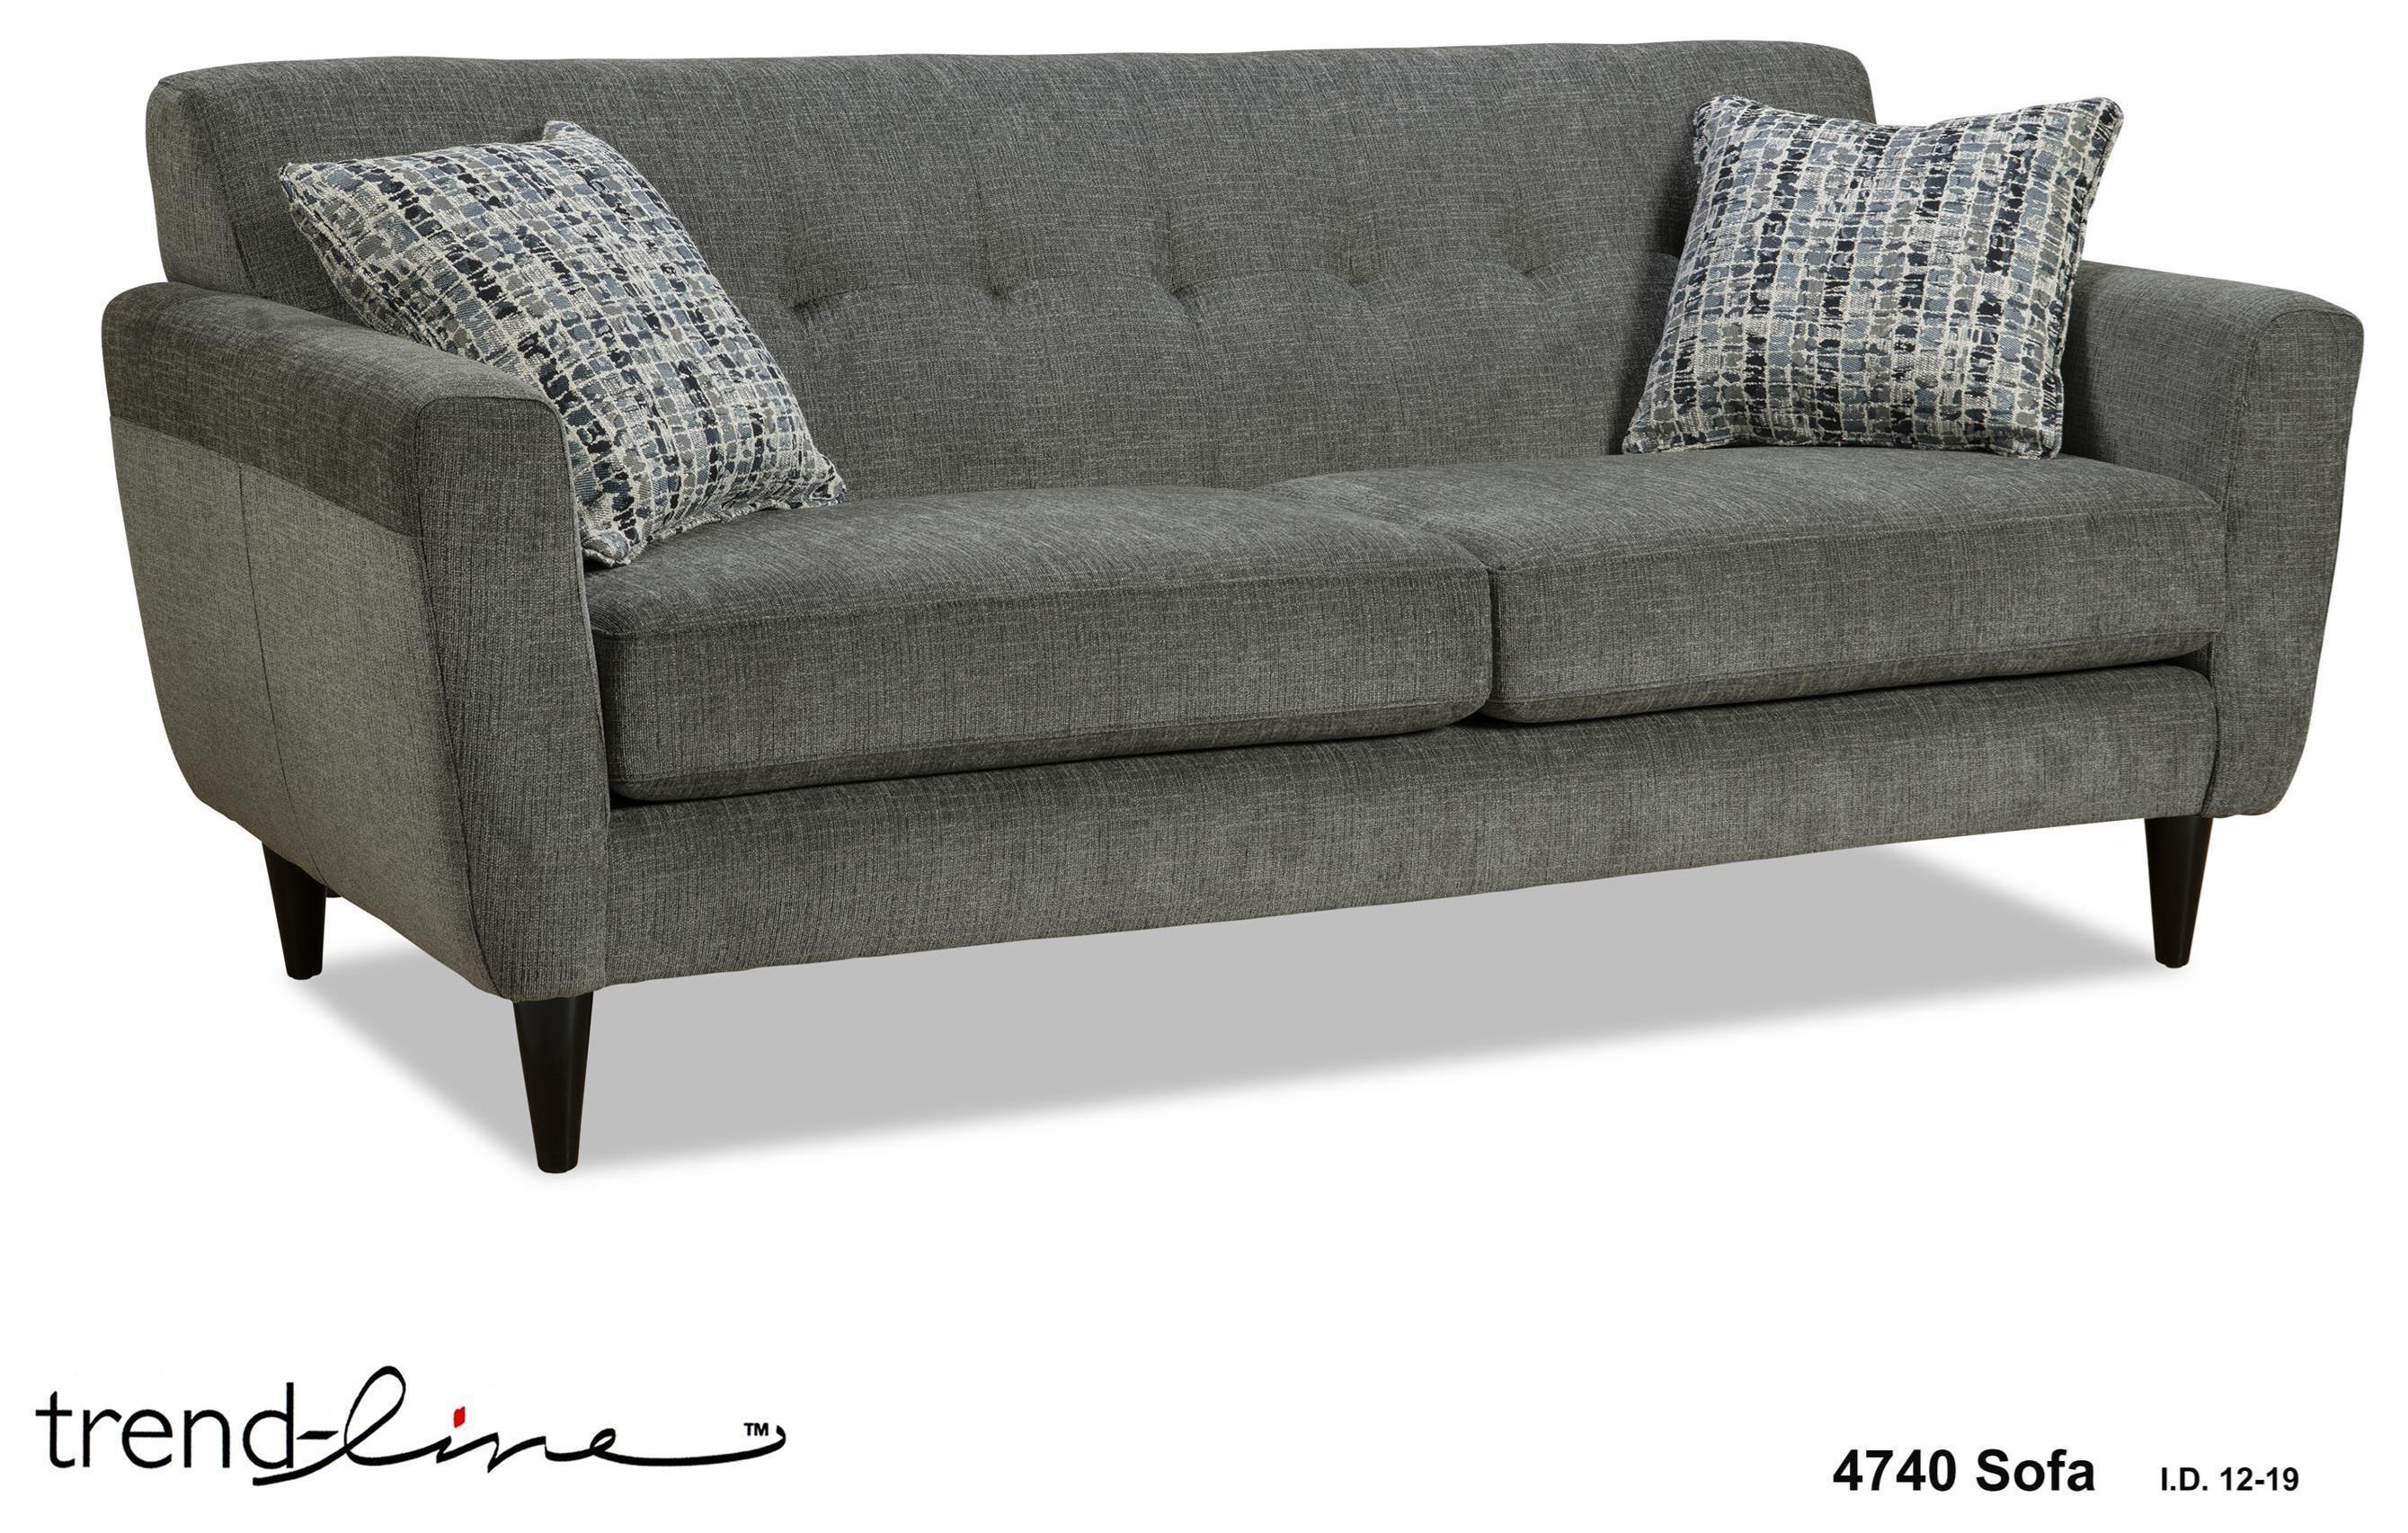 4740 Dd Sofa by Trendline at Stoney Creek Furniture